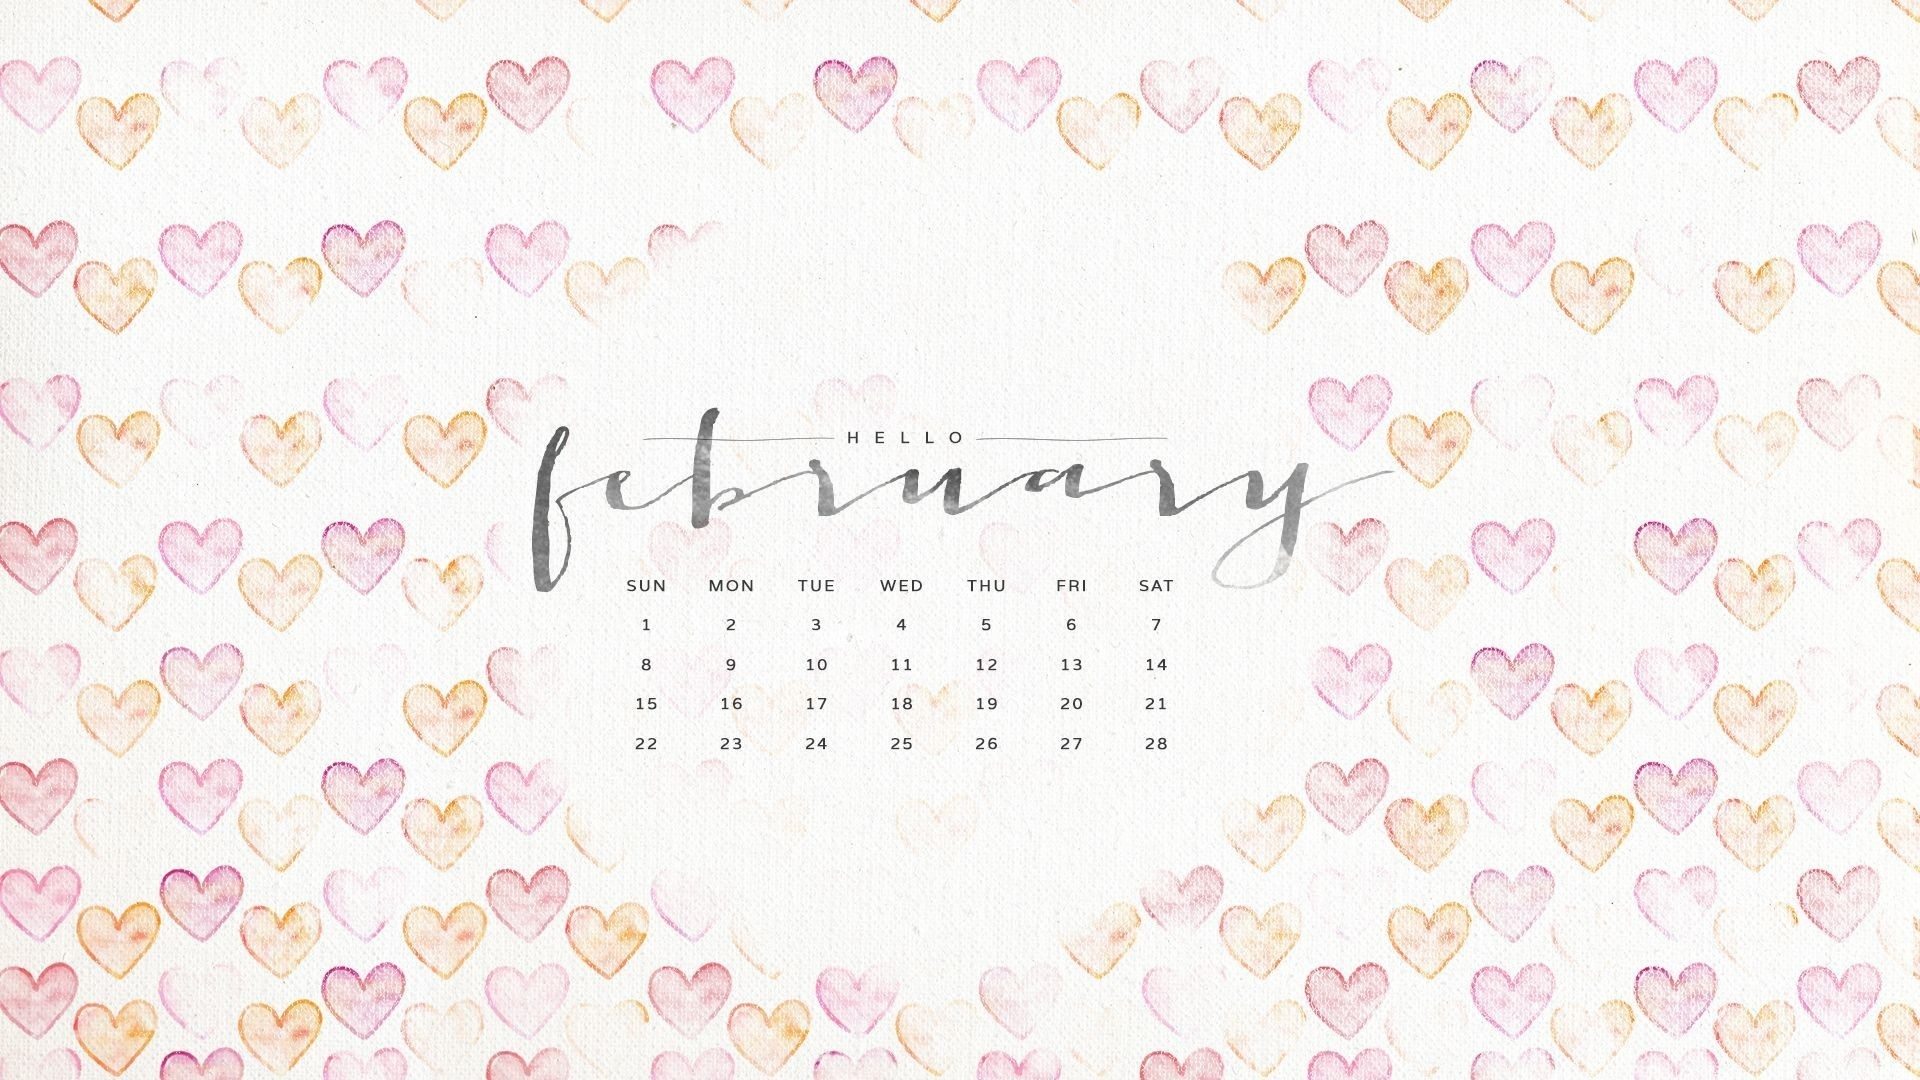 Calendar Wallpaper Live Pc : Desktop wallpaper calendar february  images